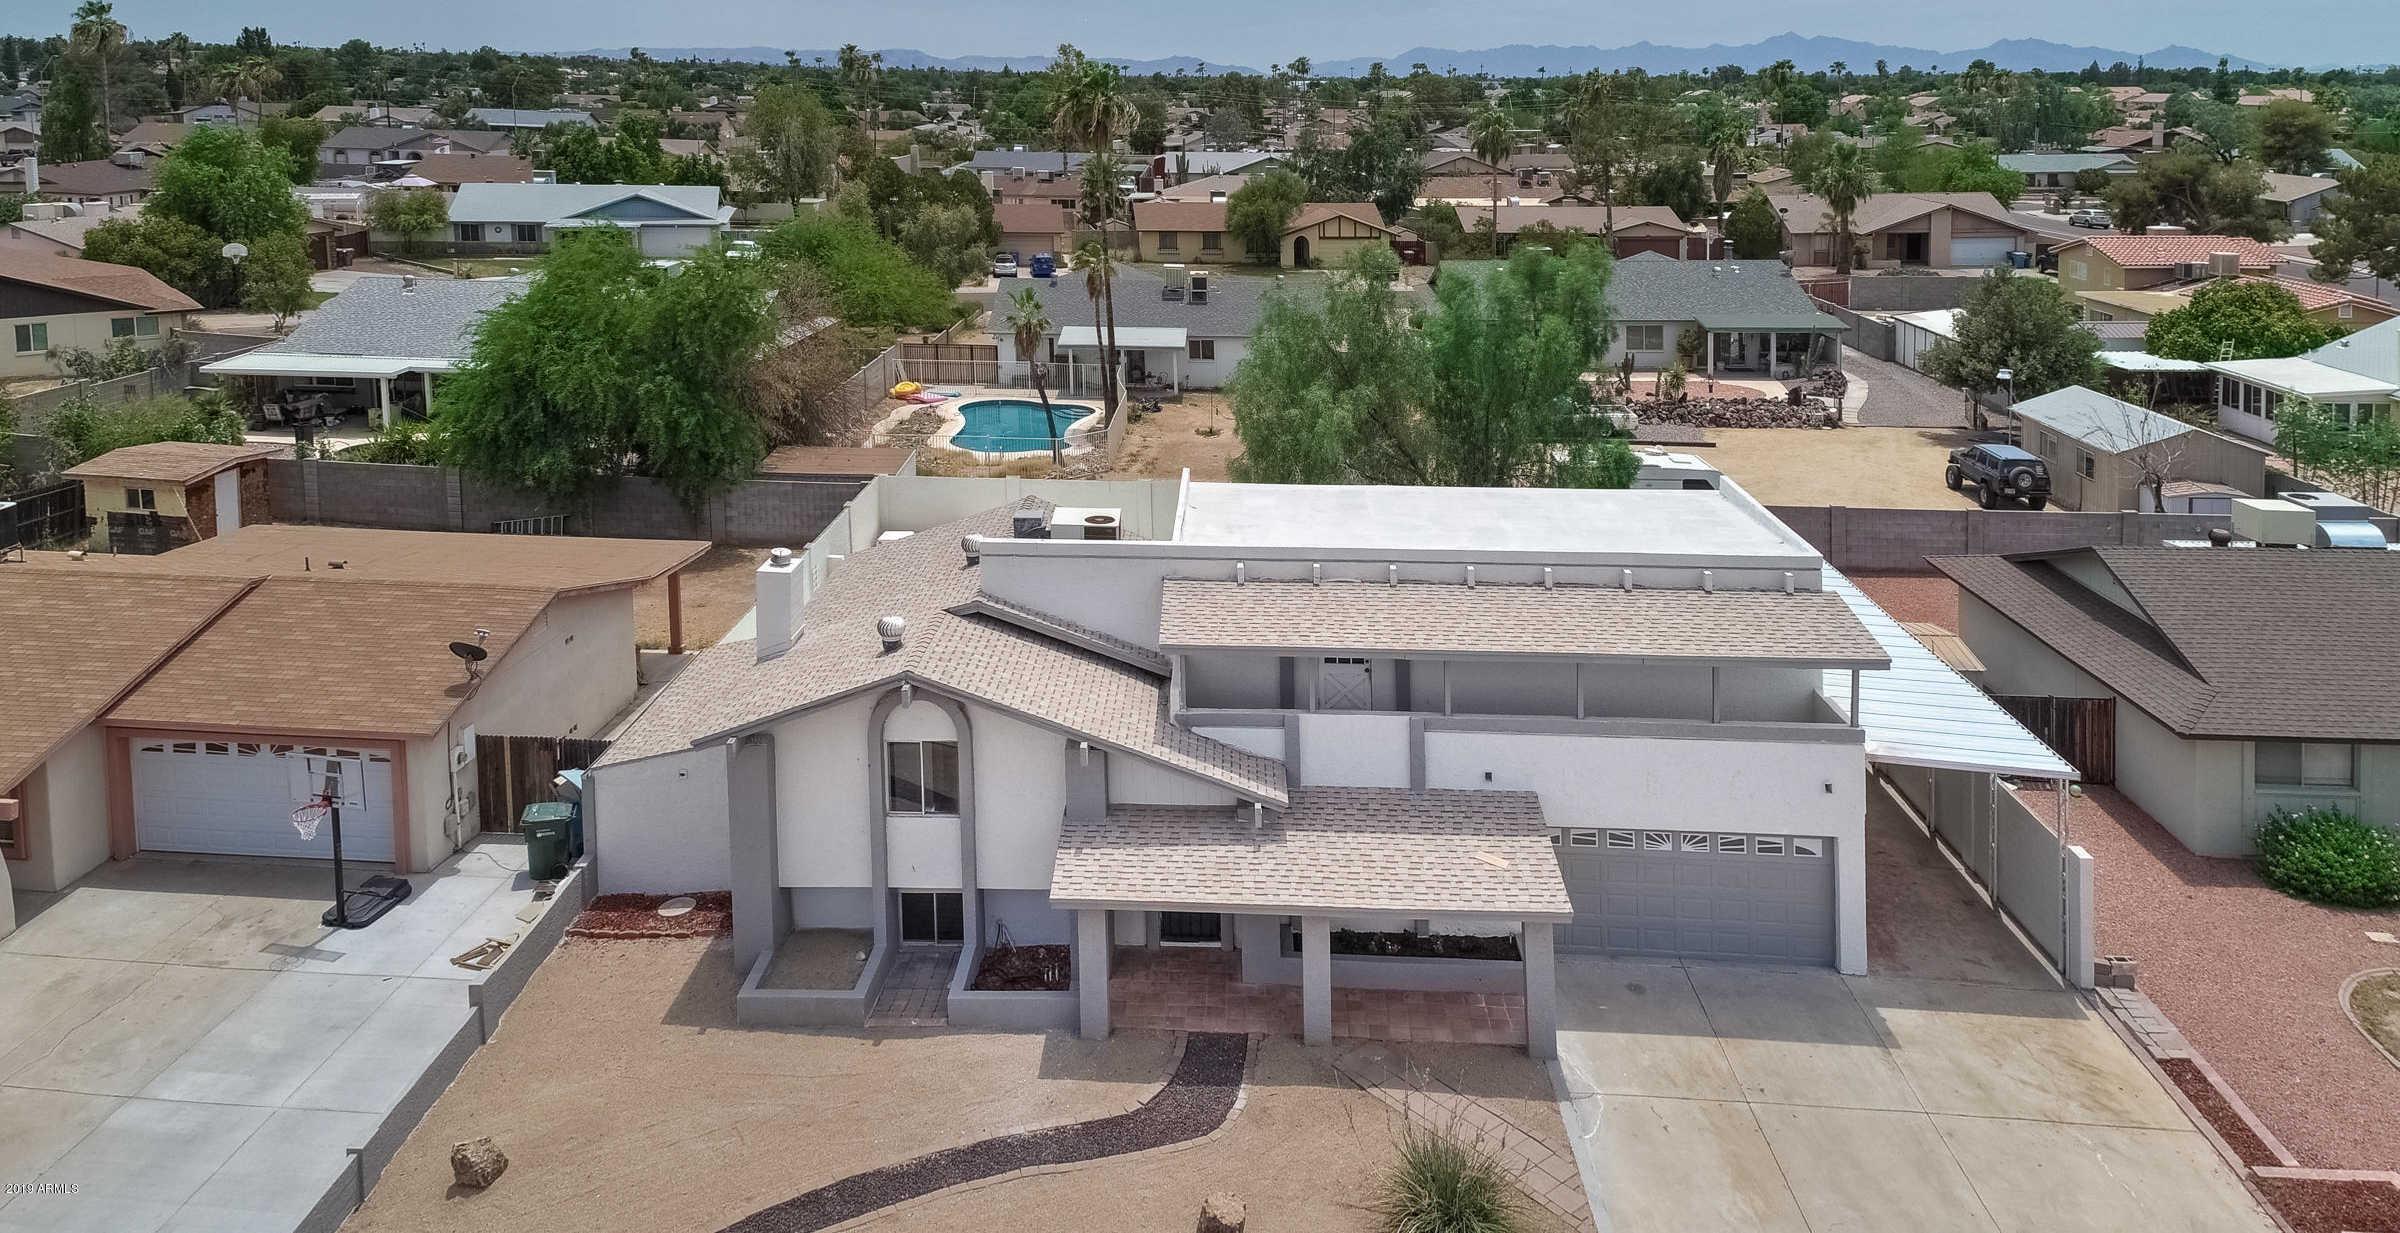 $339,949 - 5Br/3Ba - Home for Sale in Woodridge Unit 1, Glendale